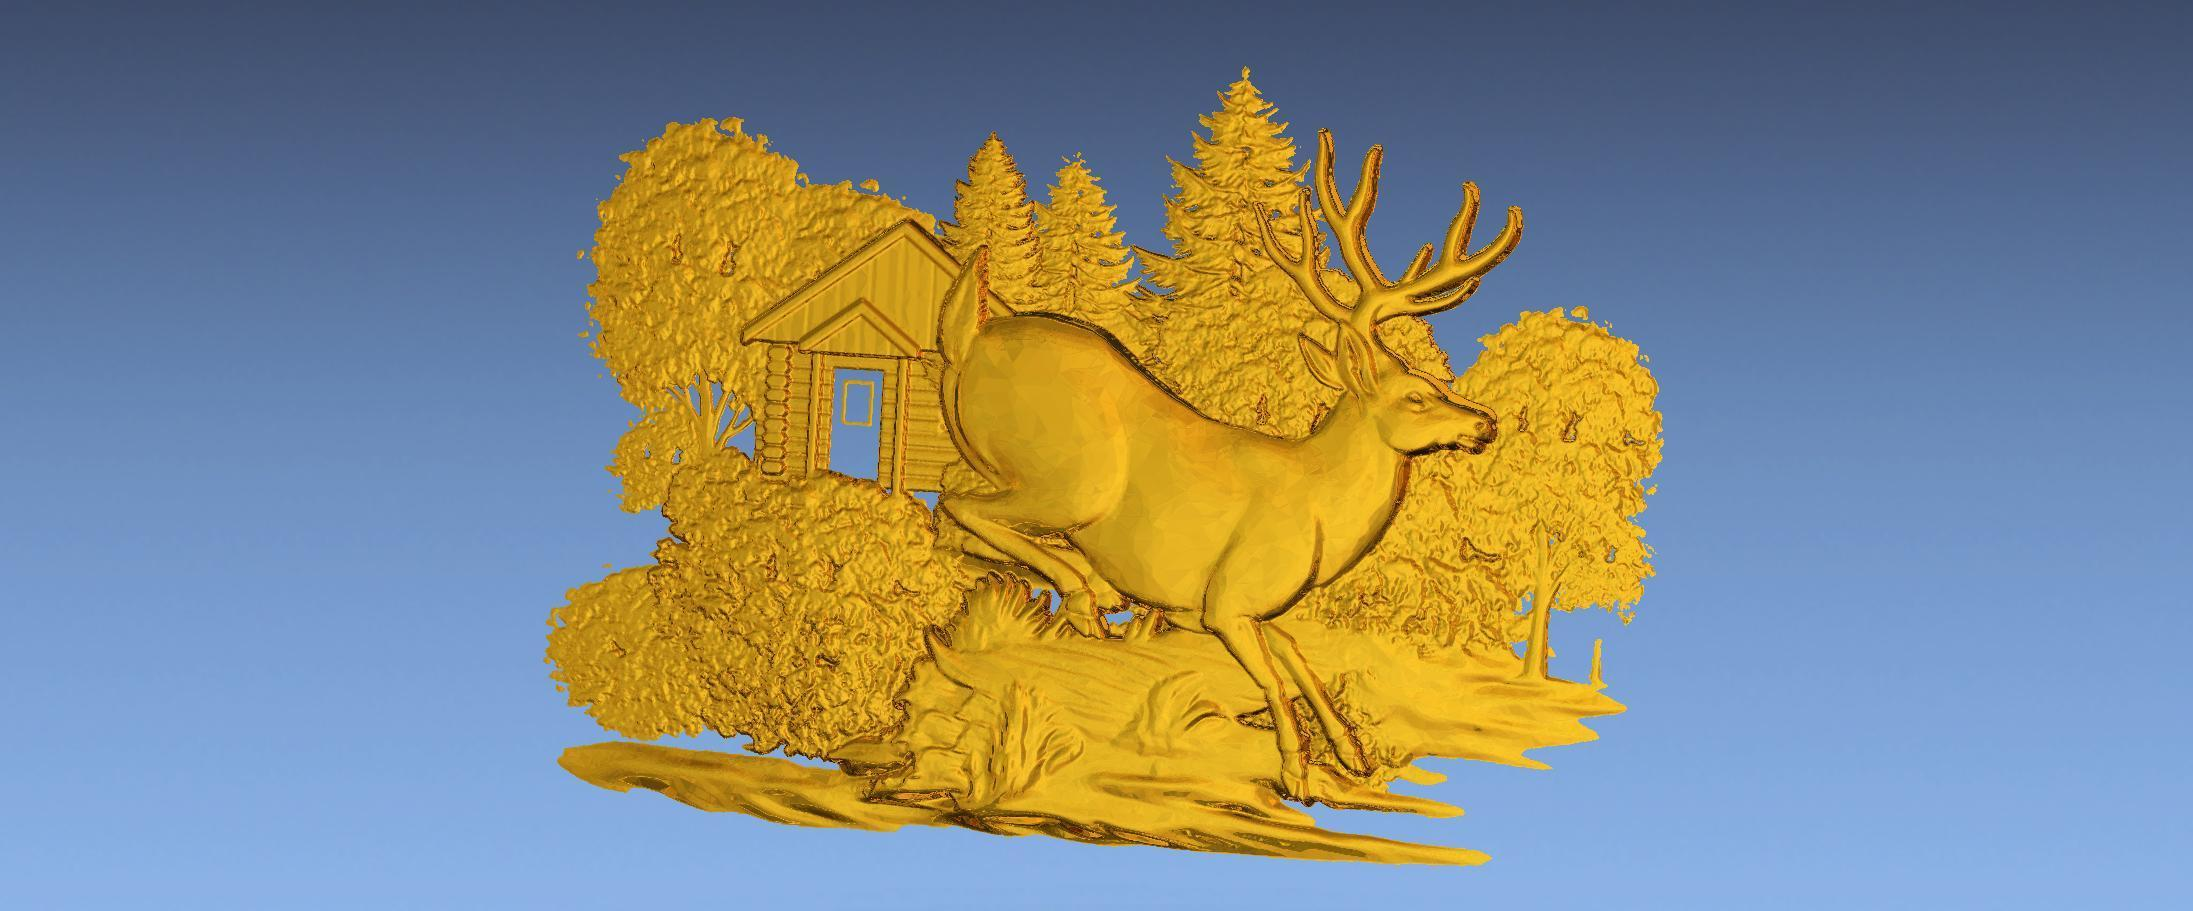 4.jpg Download free STL file 3D STL SCARED DEER • 3D print model, ALPHA_MENA